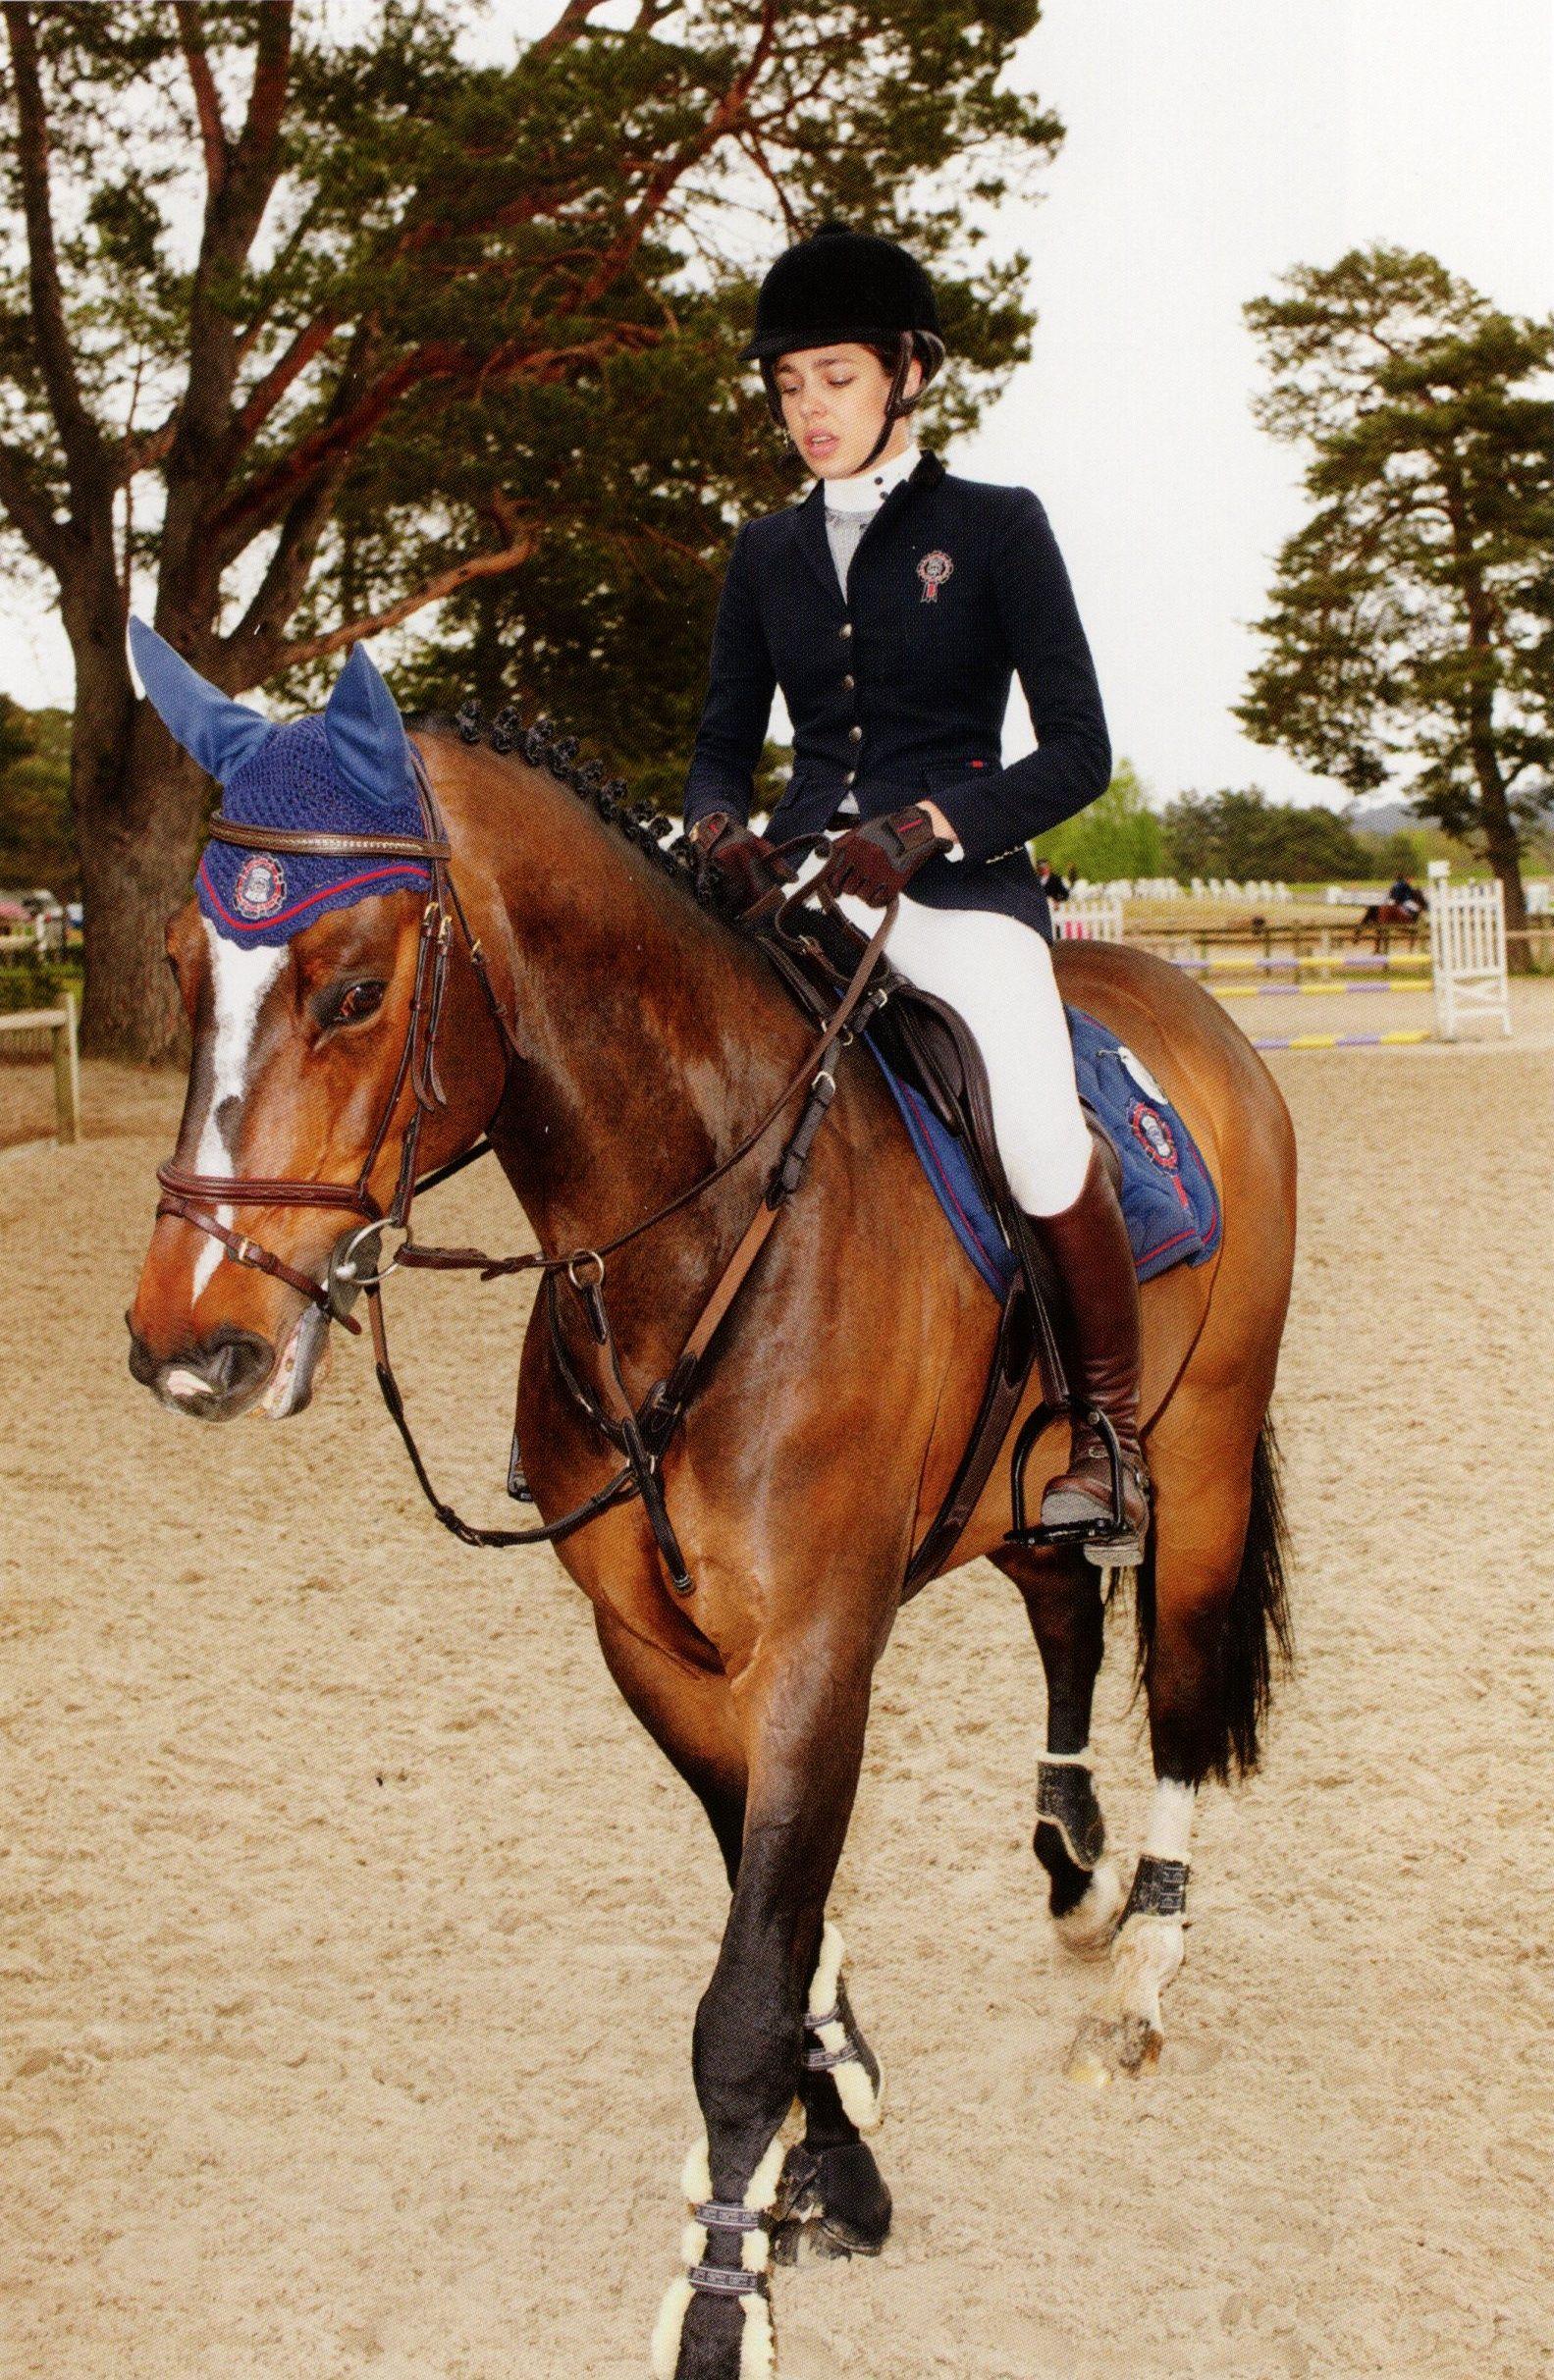 charlotte of monaco http://markdsikes.com/2012/11/20/riding-high-charlotte-casiraghi-part-2/